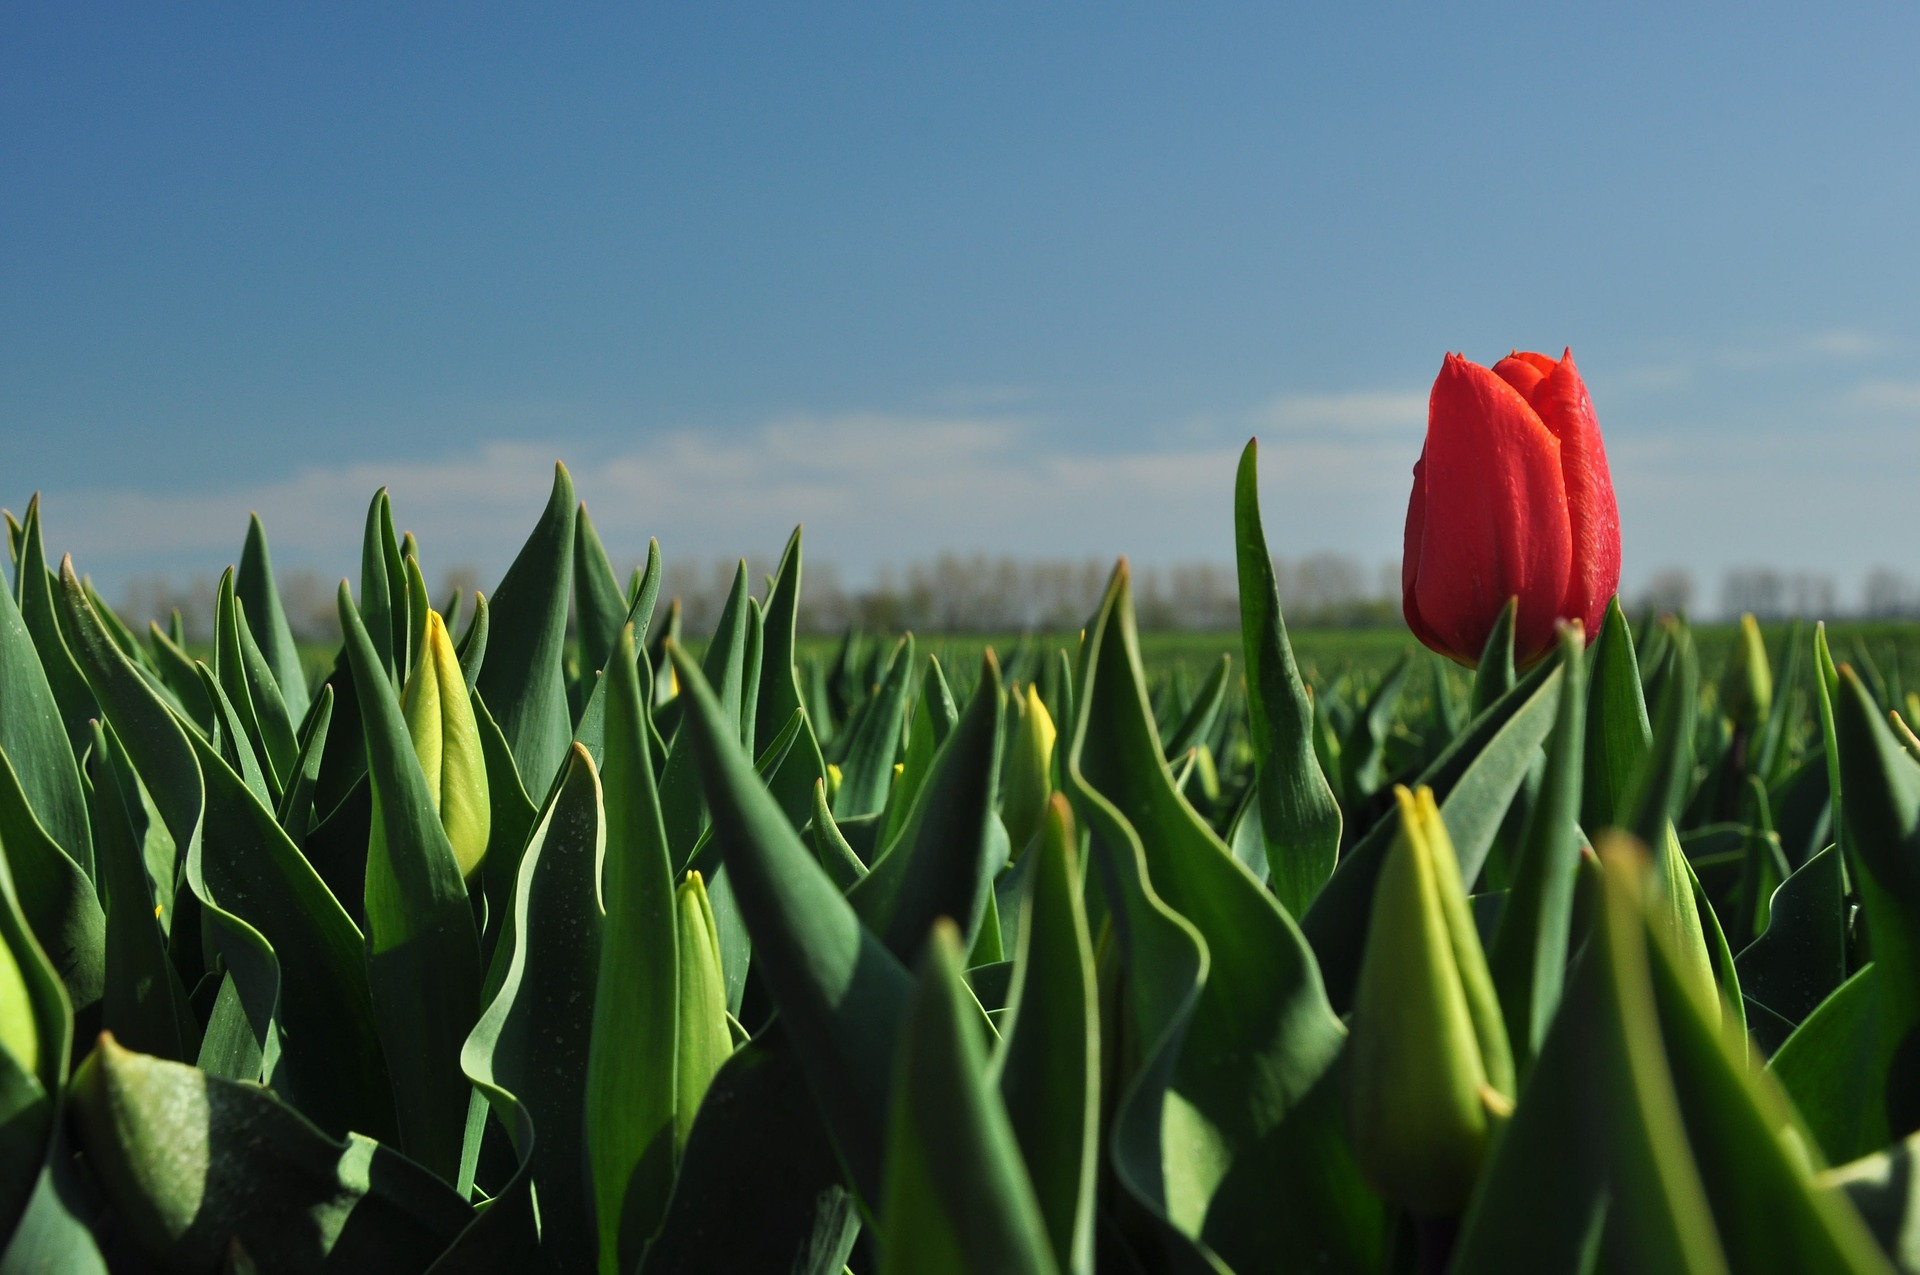 tulip-2355000_1920.jpg